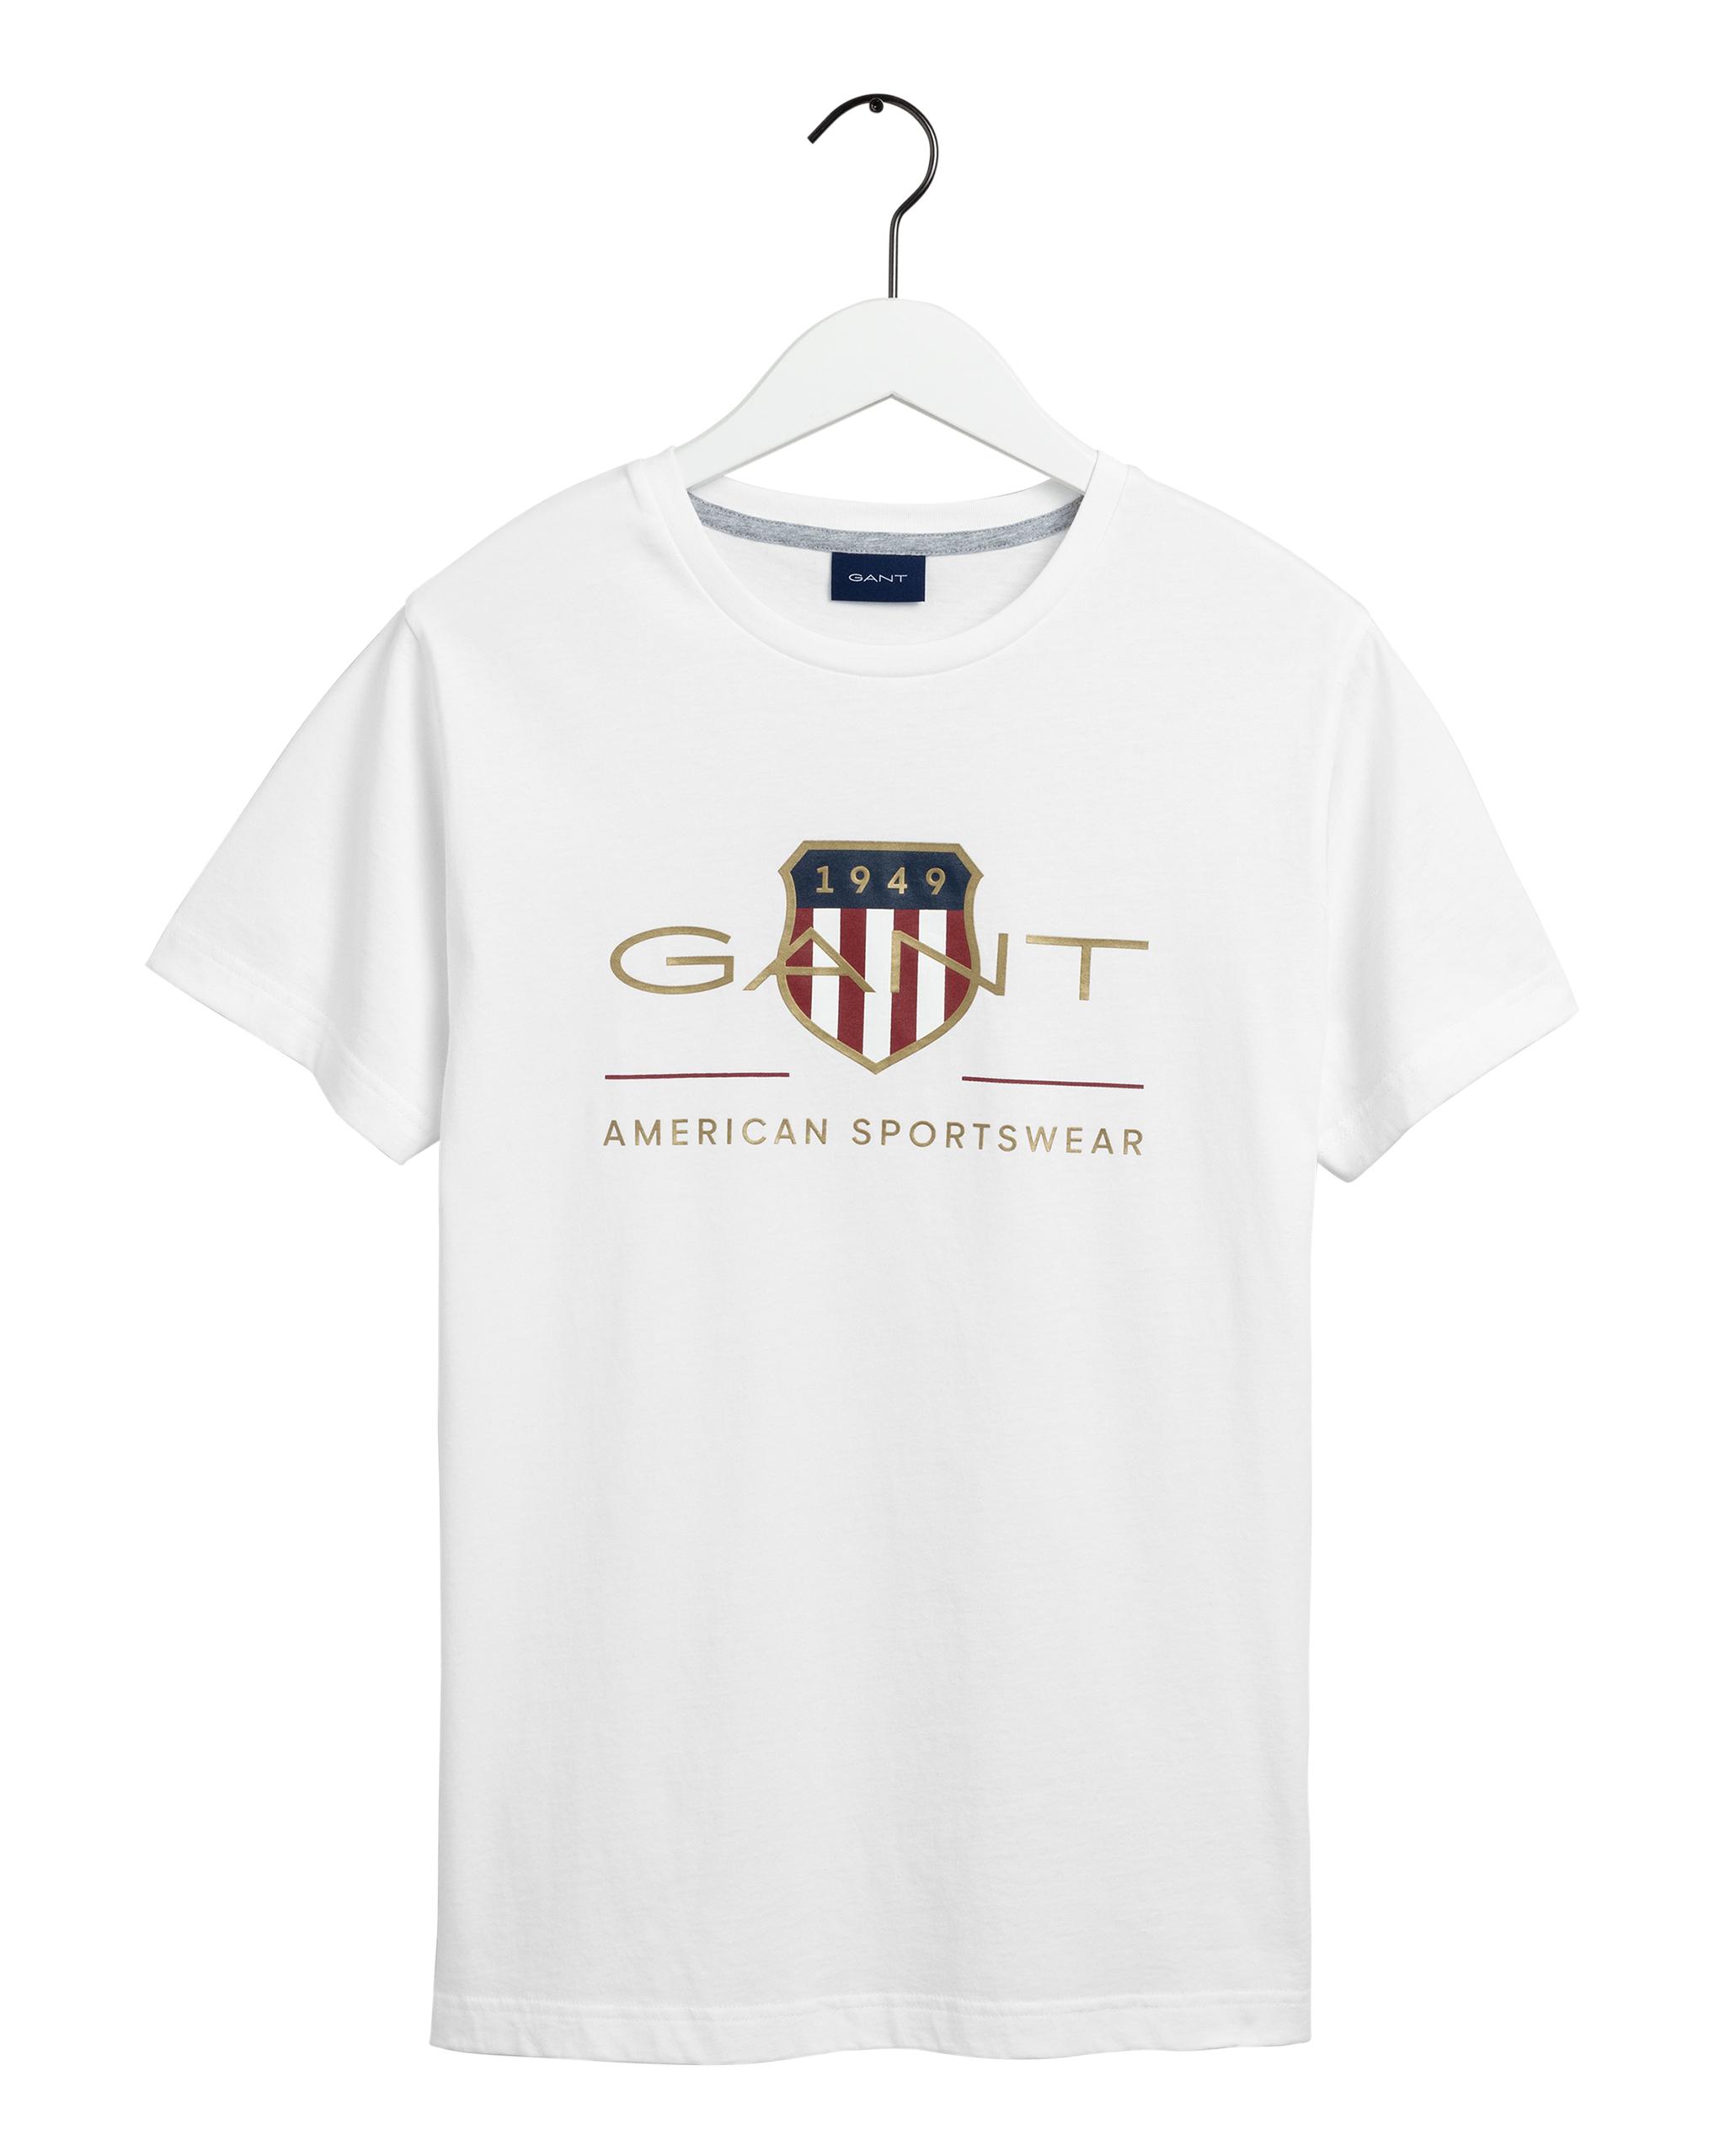 Gant Archive Shield t-shirt, white, xxx-large